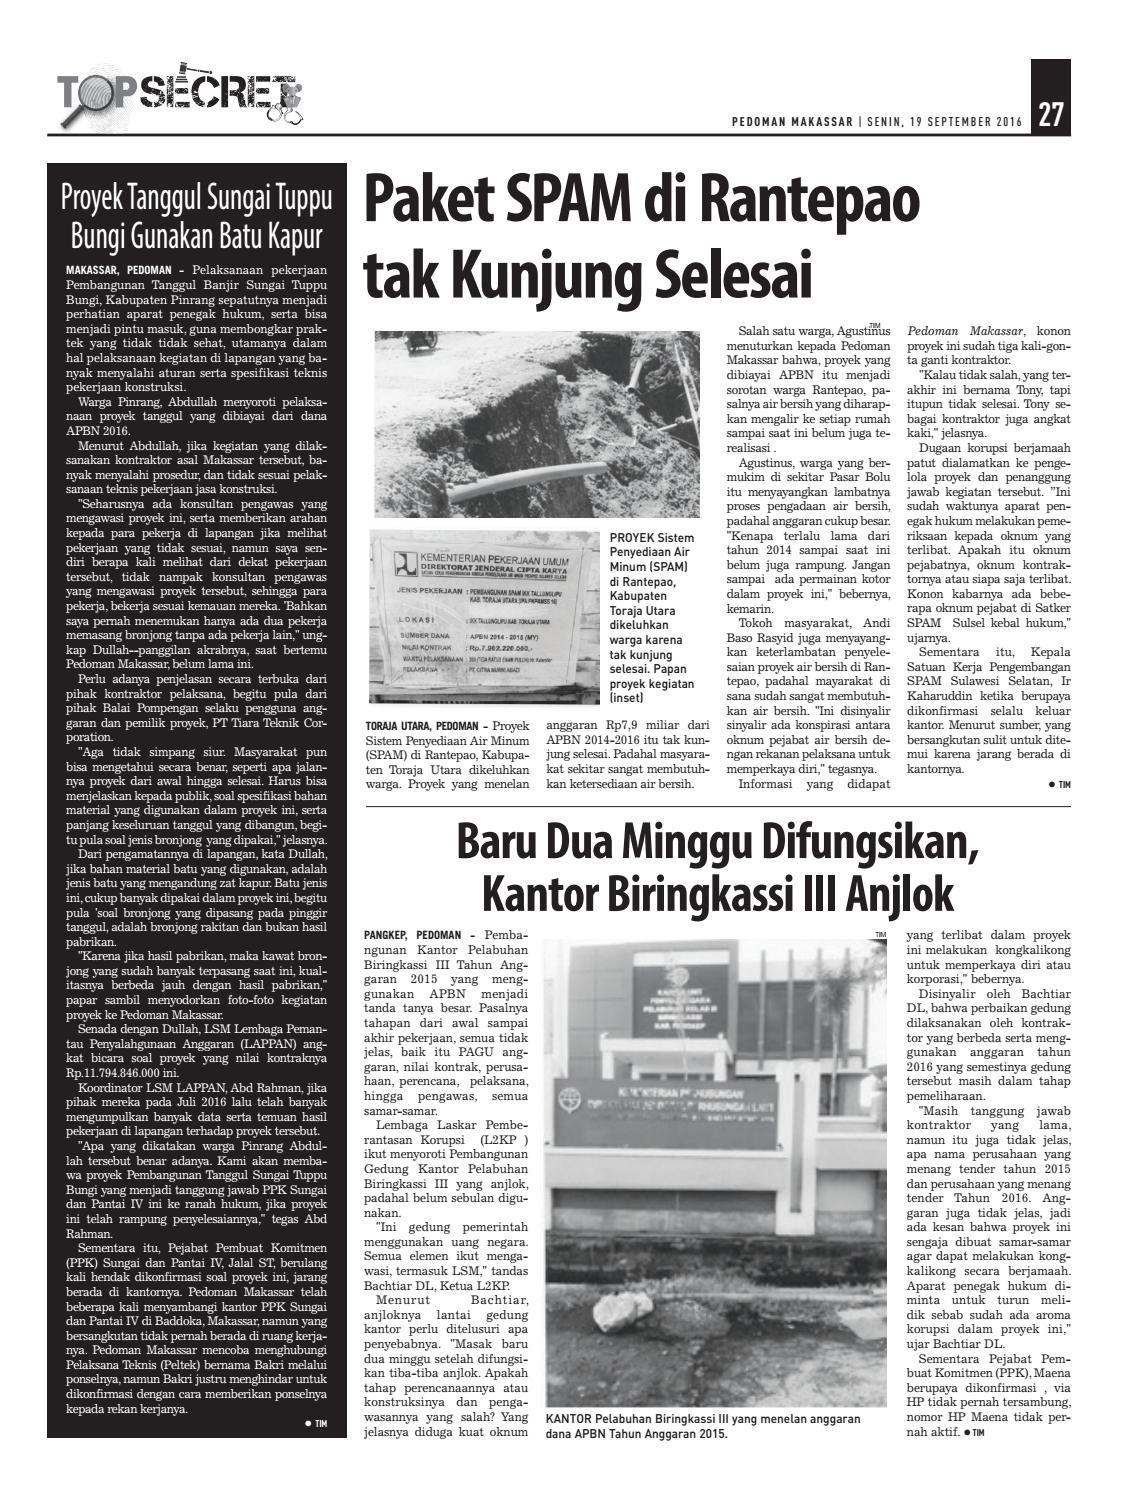 Edisi 49 19 September 2016 Pedoman Makassar By Juug Untuk Air Minum Issuu